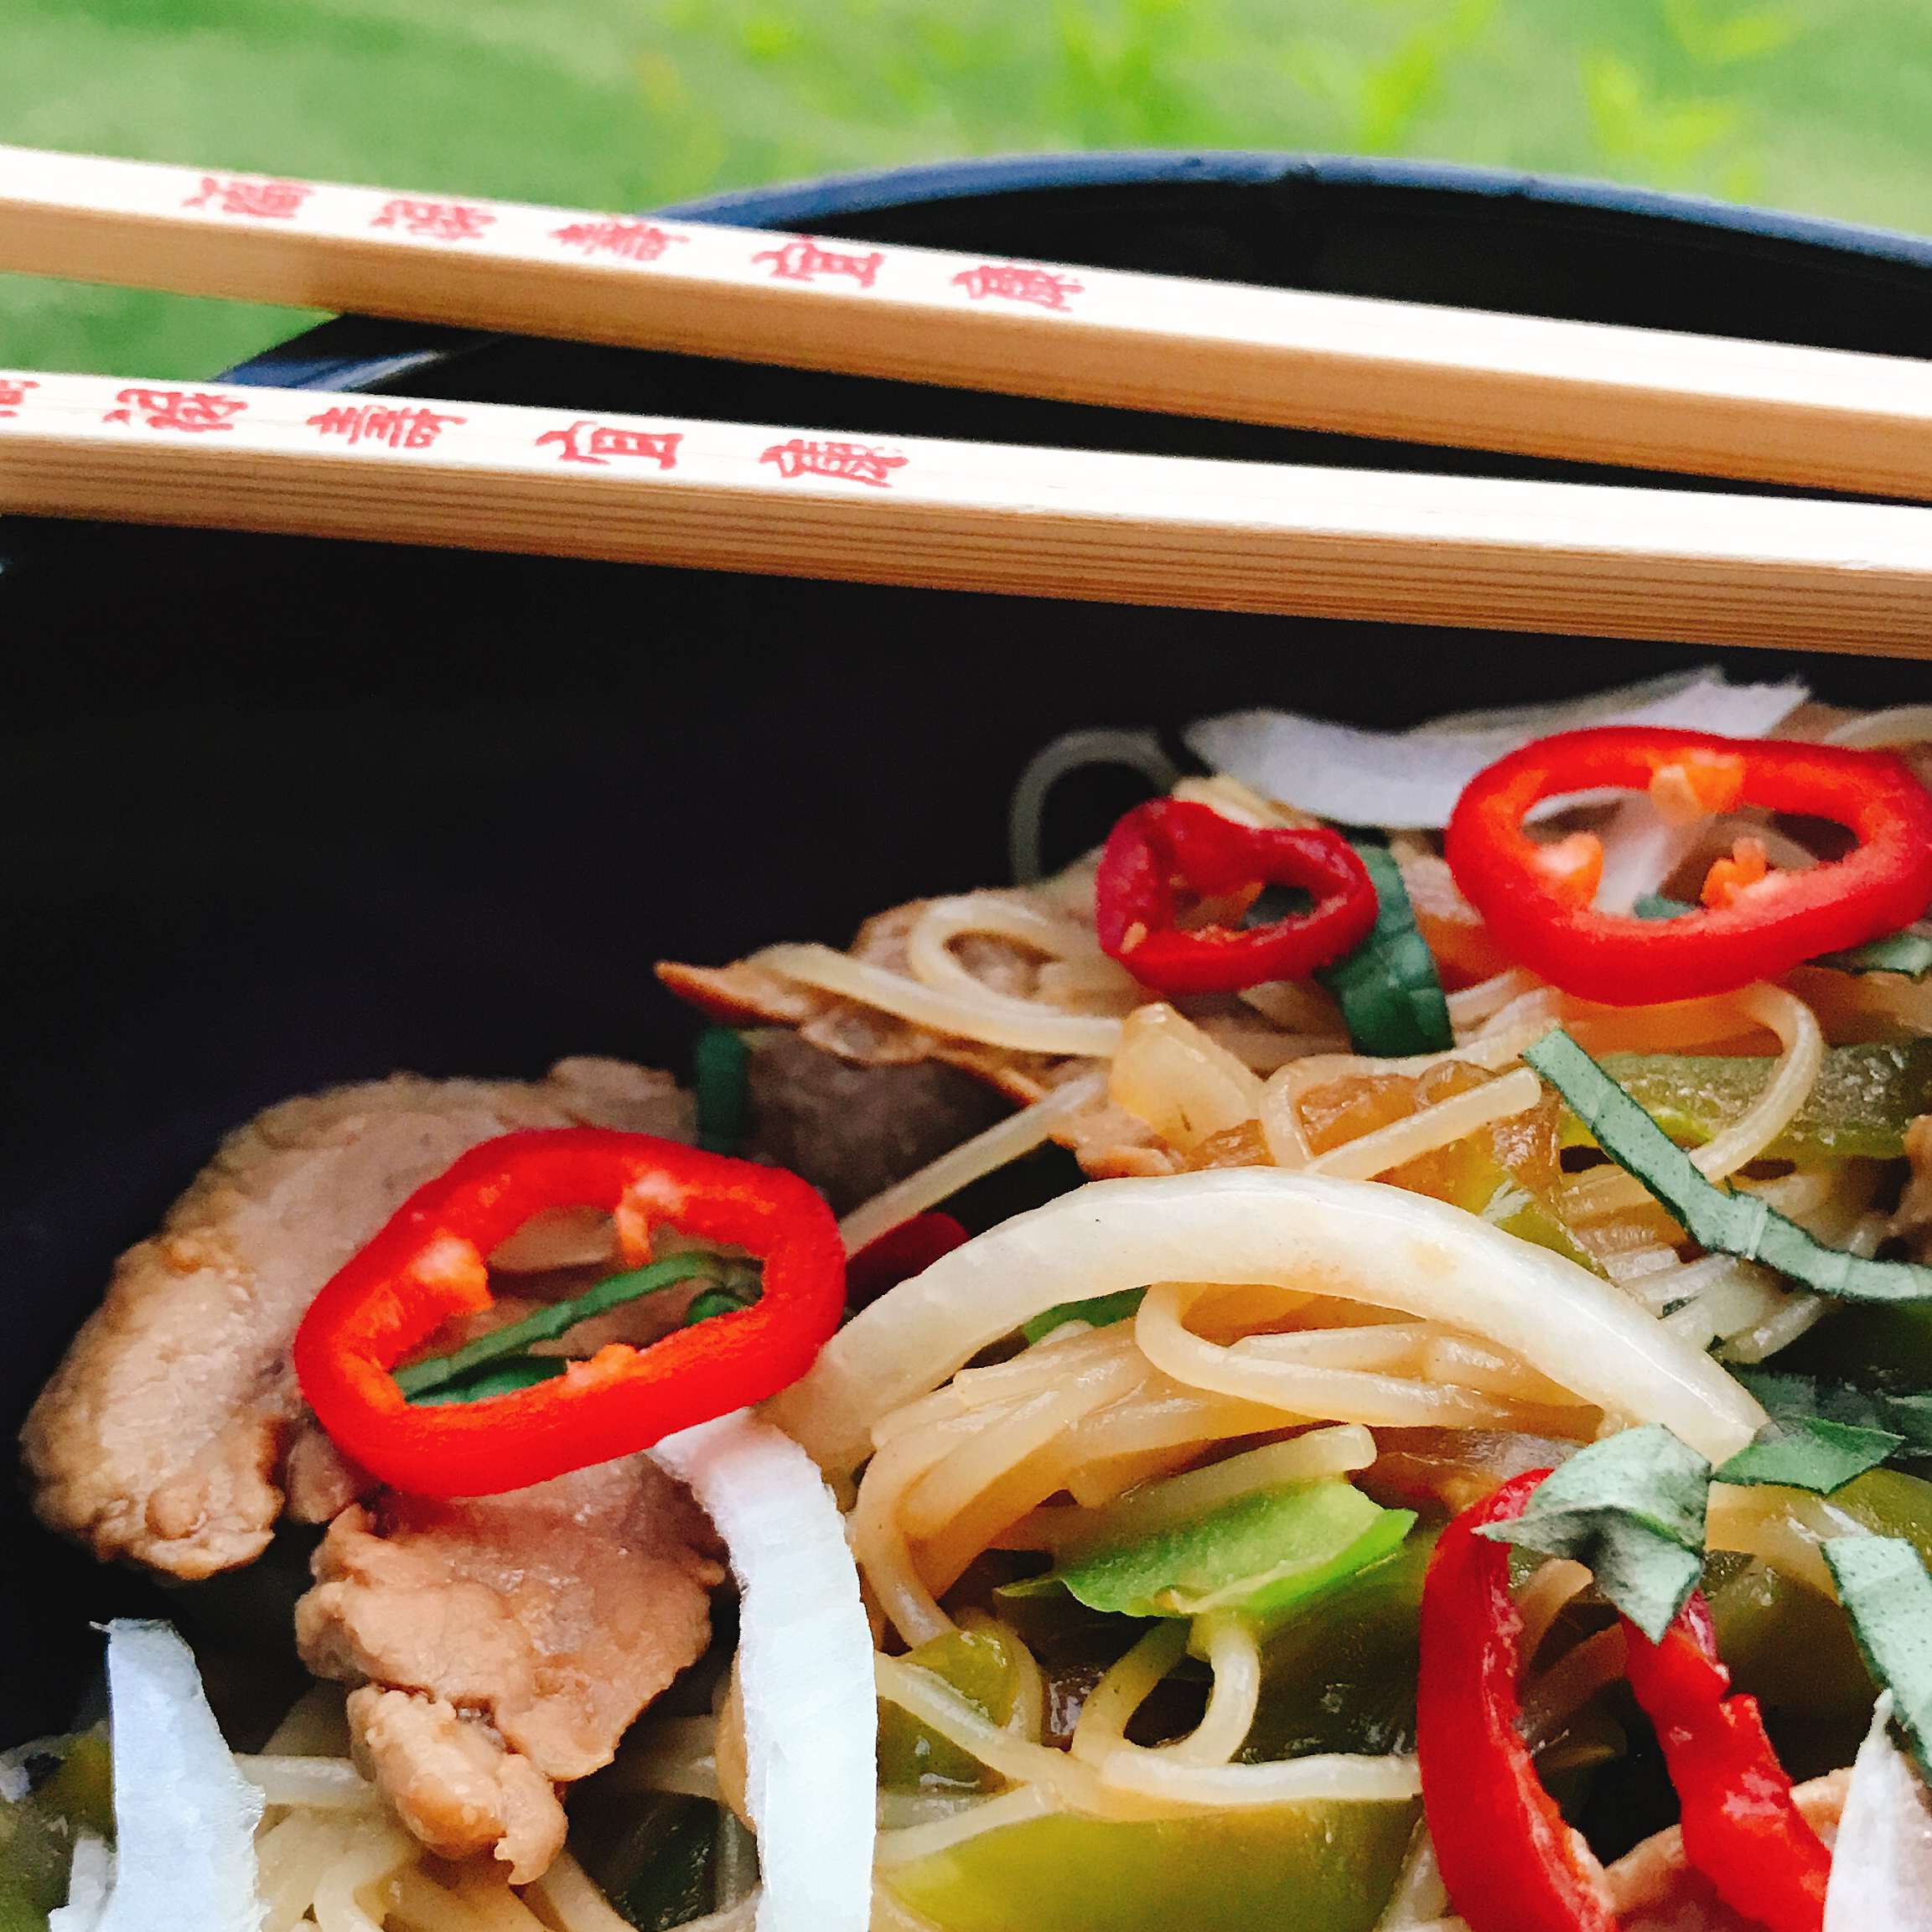 Pad Krapao (Thai Stir-Fry Pork with Basil)